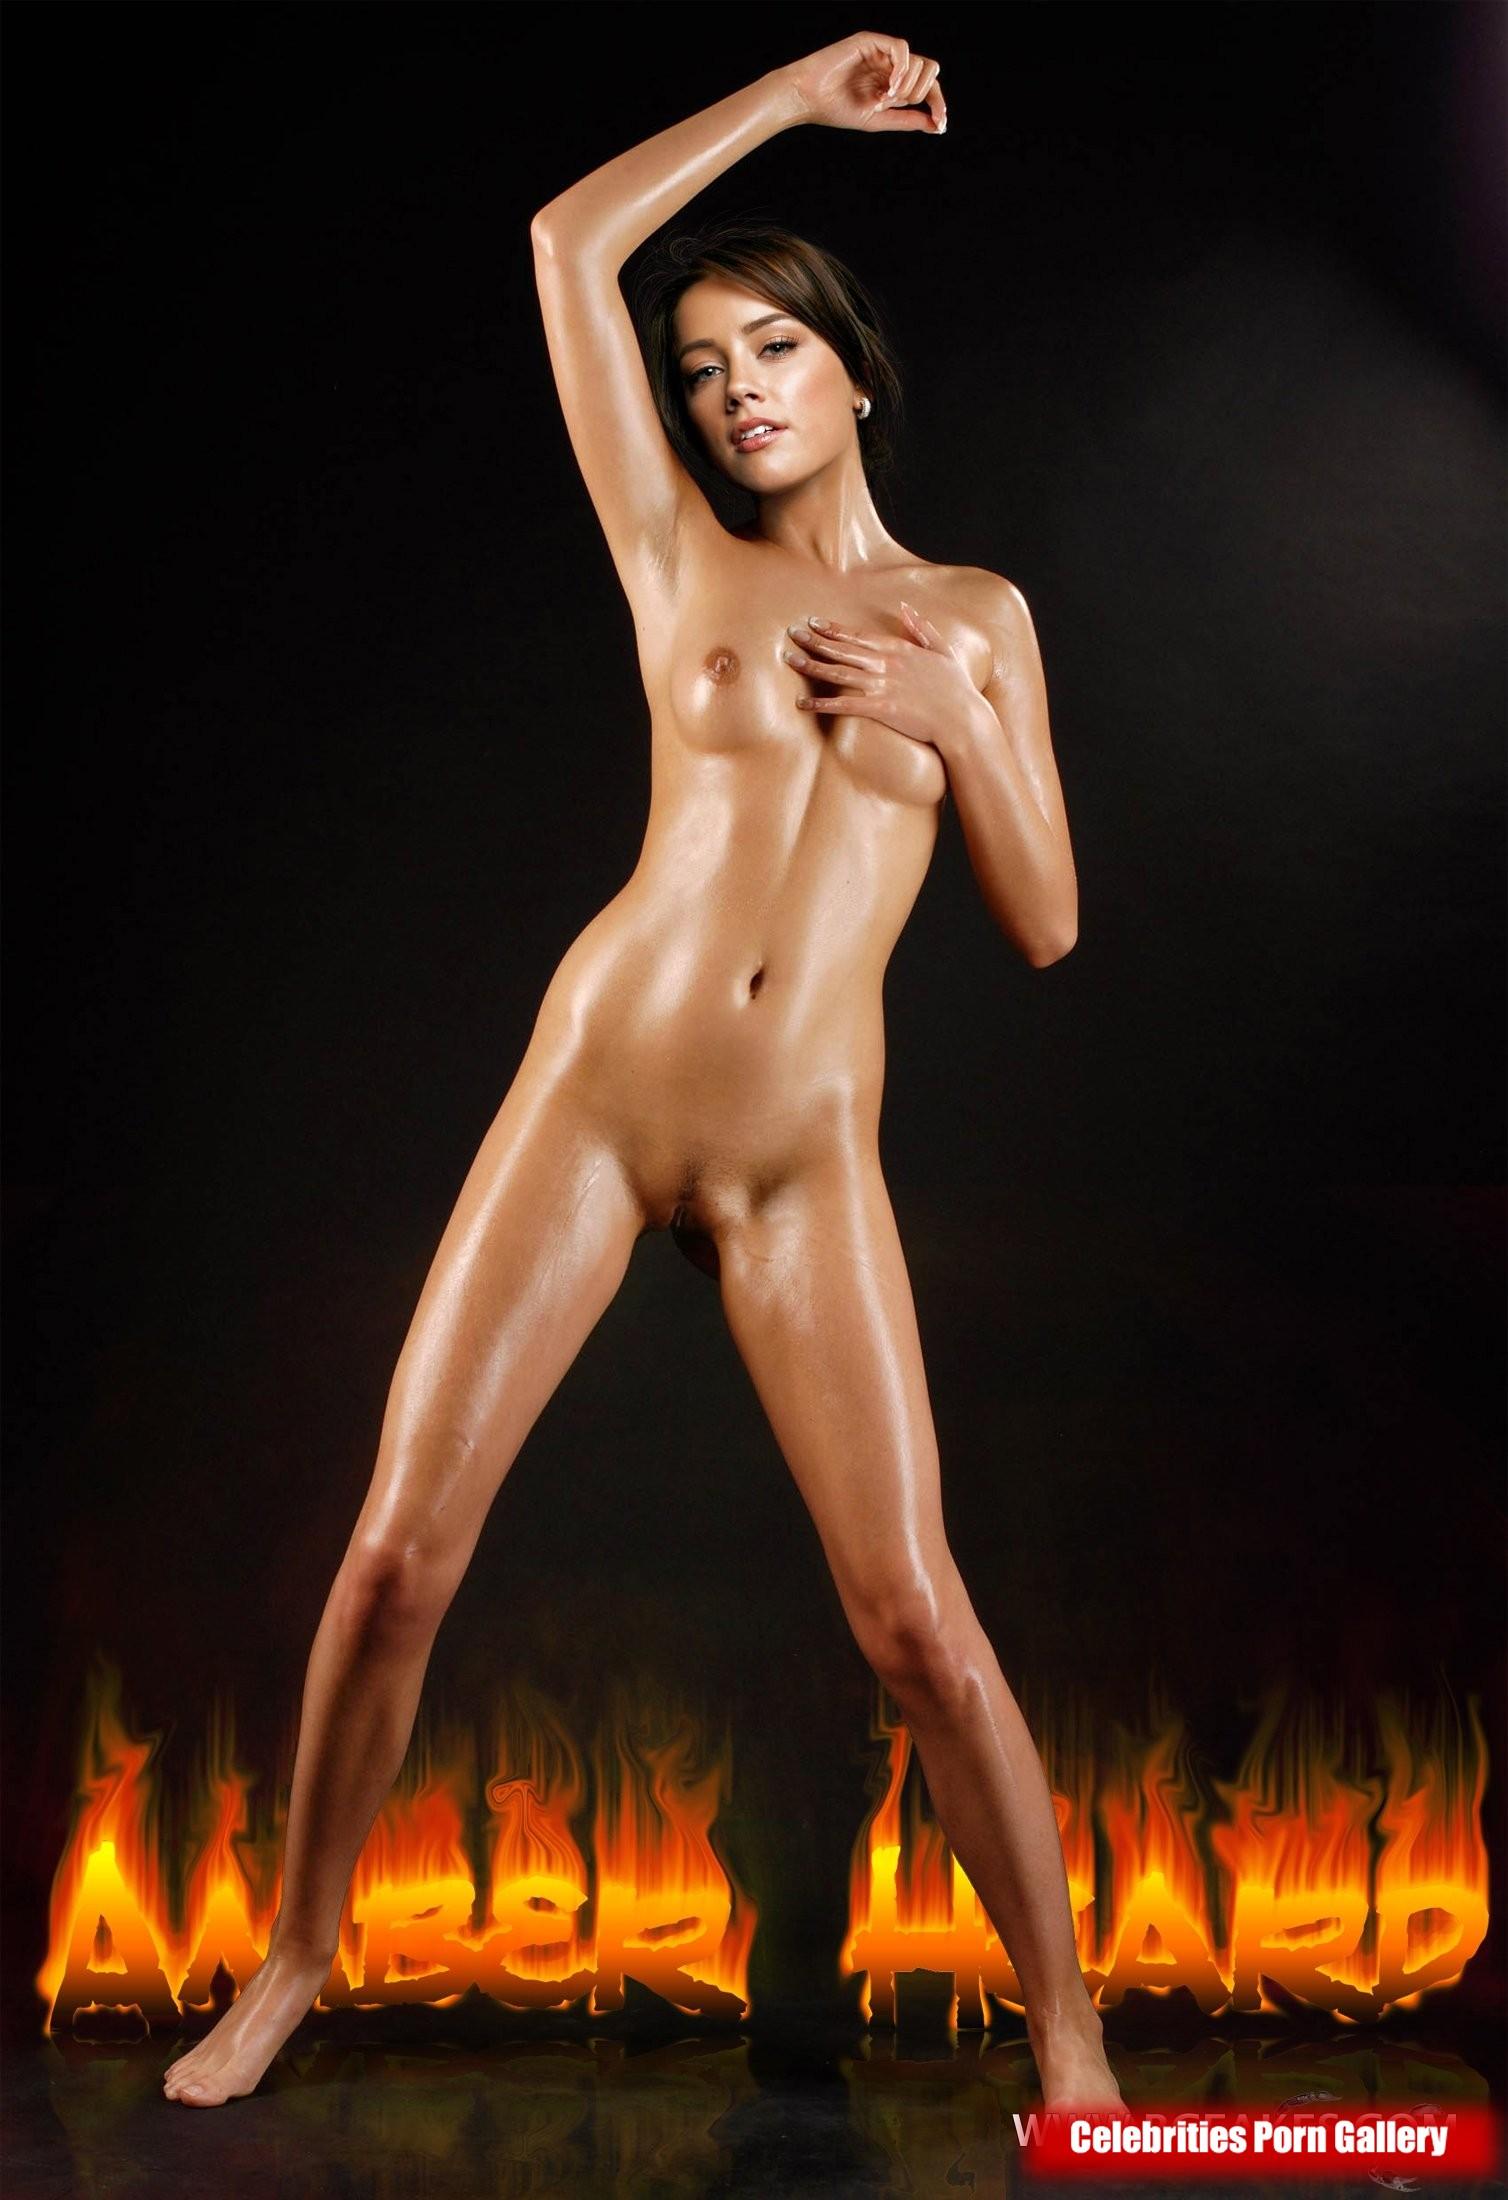 Final, amber mross nude gallery free